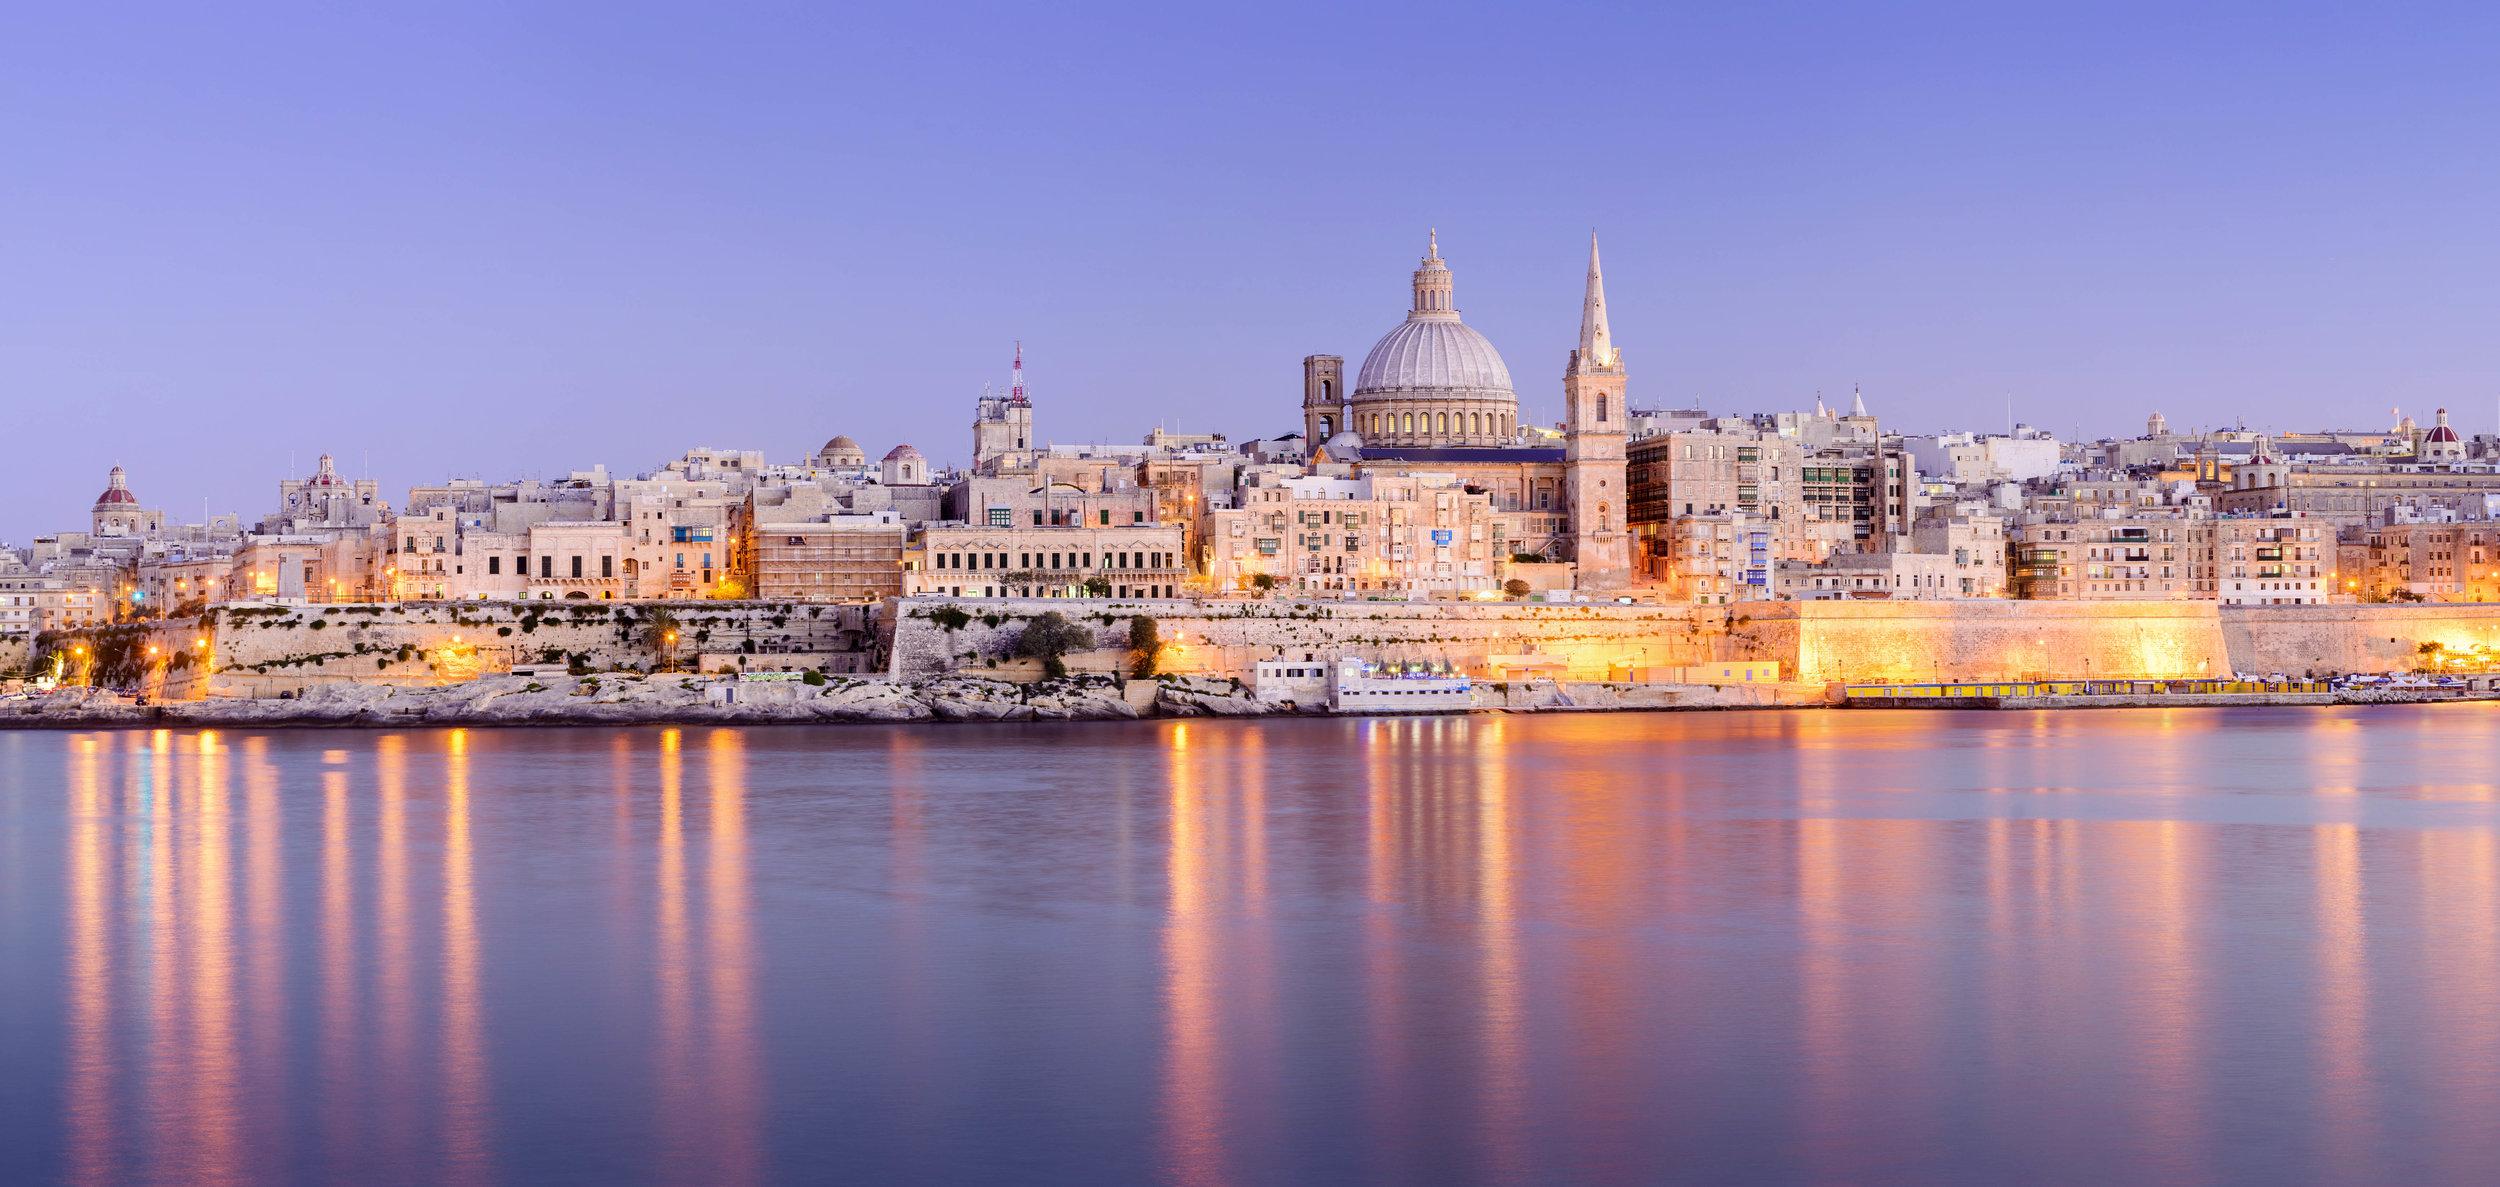 Malta_Valletta_StPaulsAnglicanCathedralandCarmelite_Church_iStock-187988473.jpg